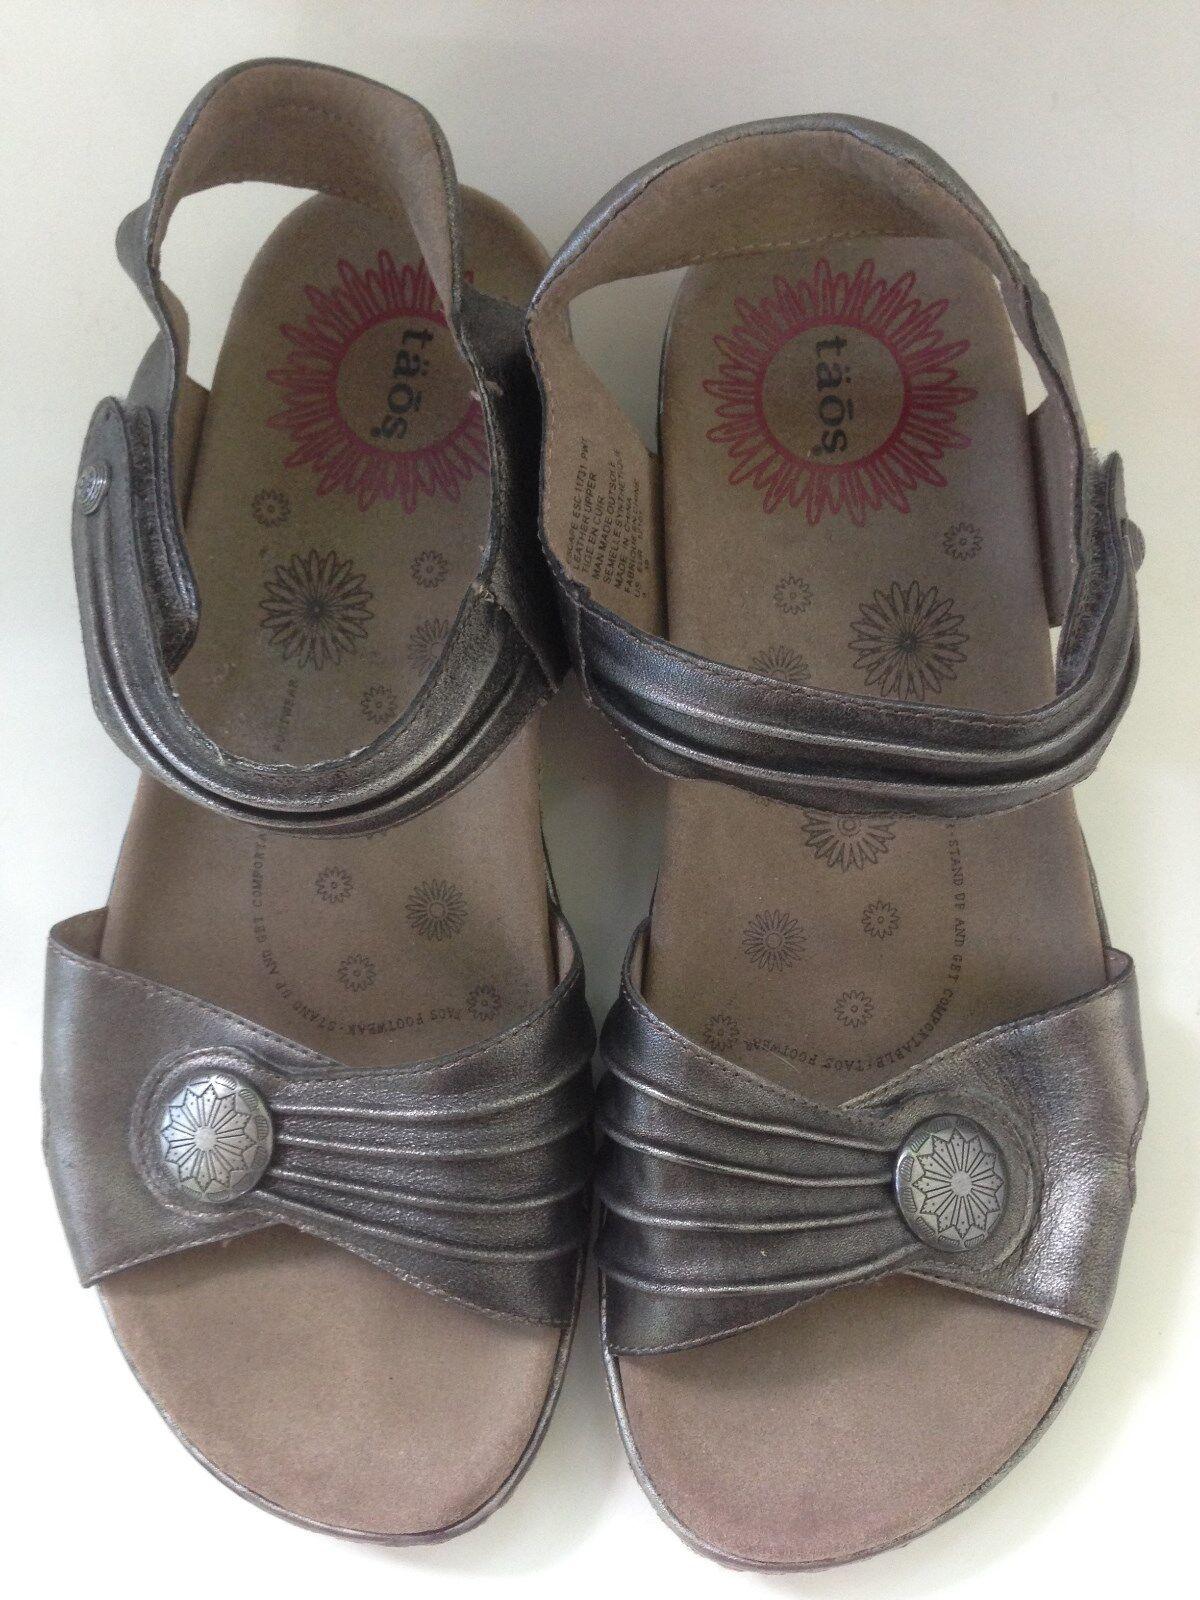 Taos para mujer Escape Estaño Con Tiras Sandalia cómoda ajustable de plata tamaño del zapato 9